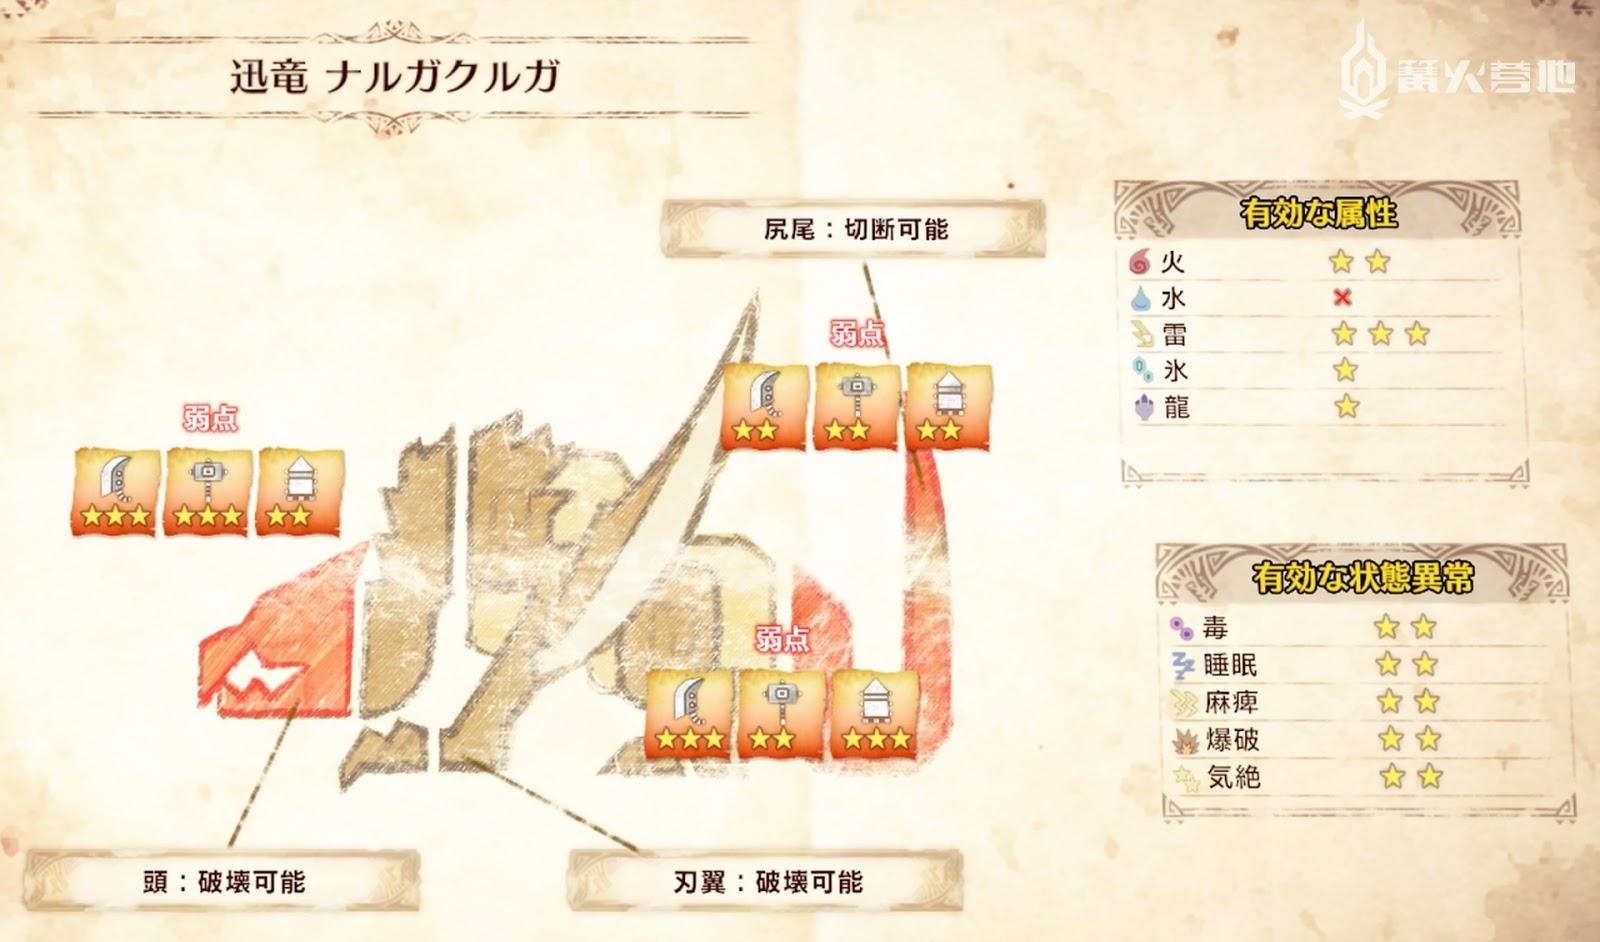 mhw Iceborne 迅龍屬性弱點攻略 - 魔物獵人 世界 Monster Hunter World 遊戲世界